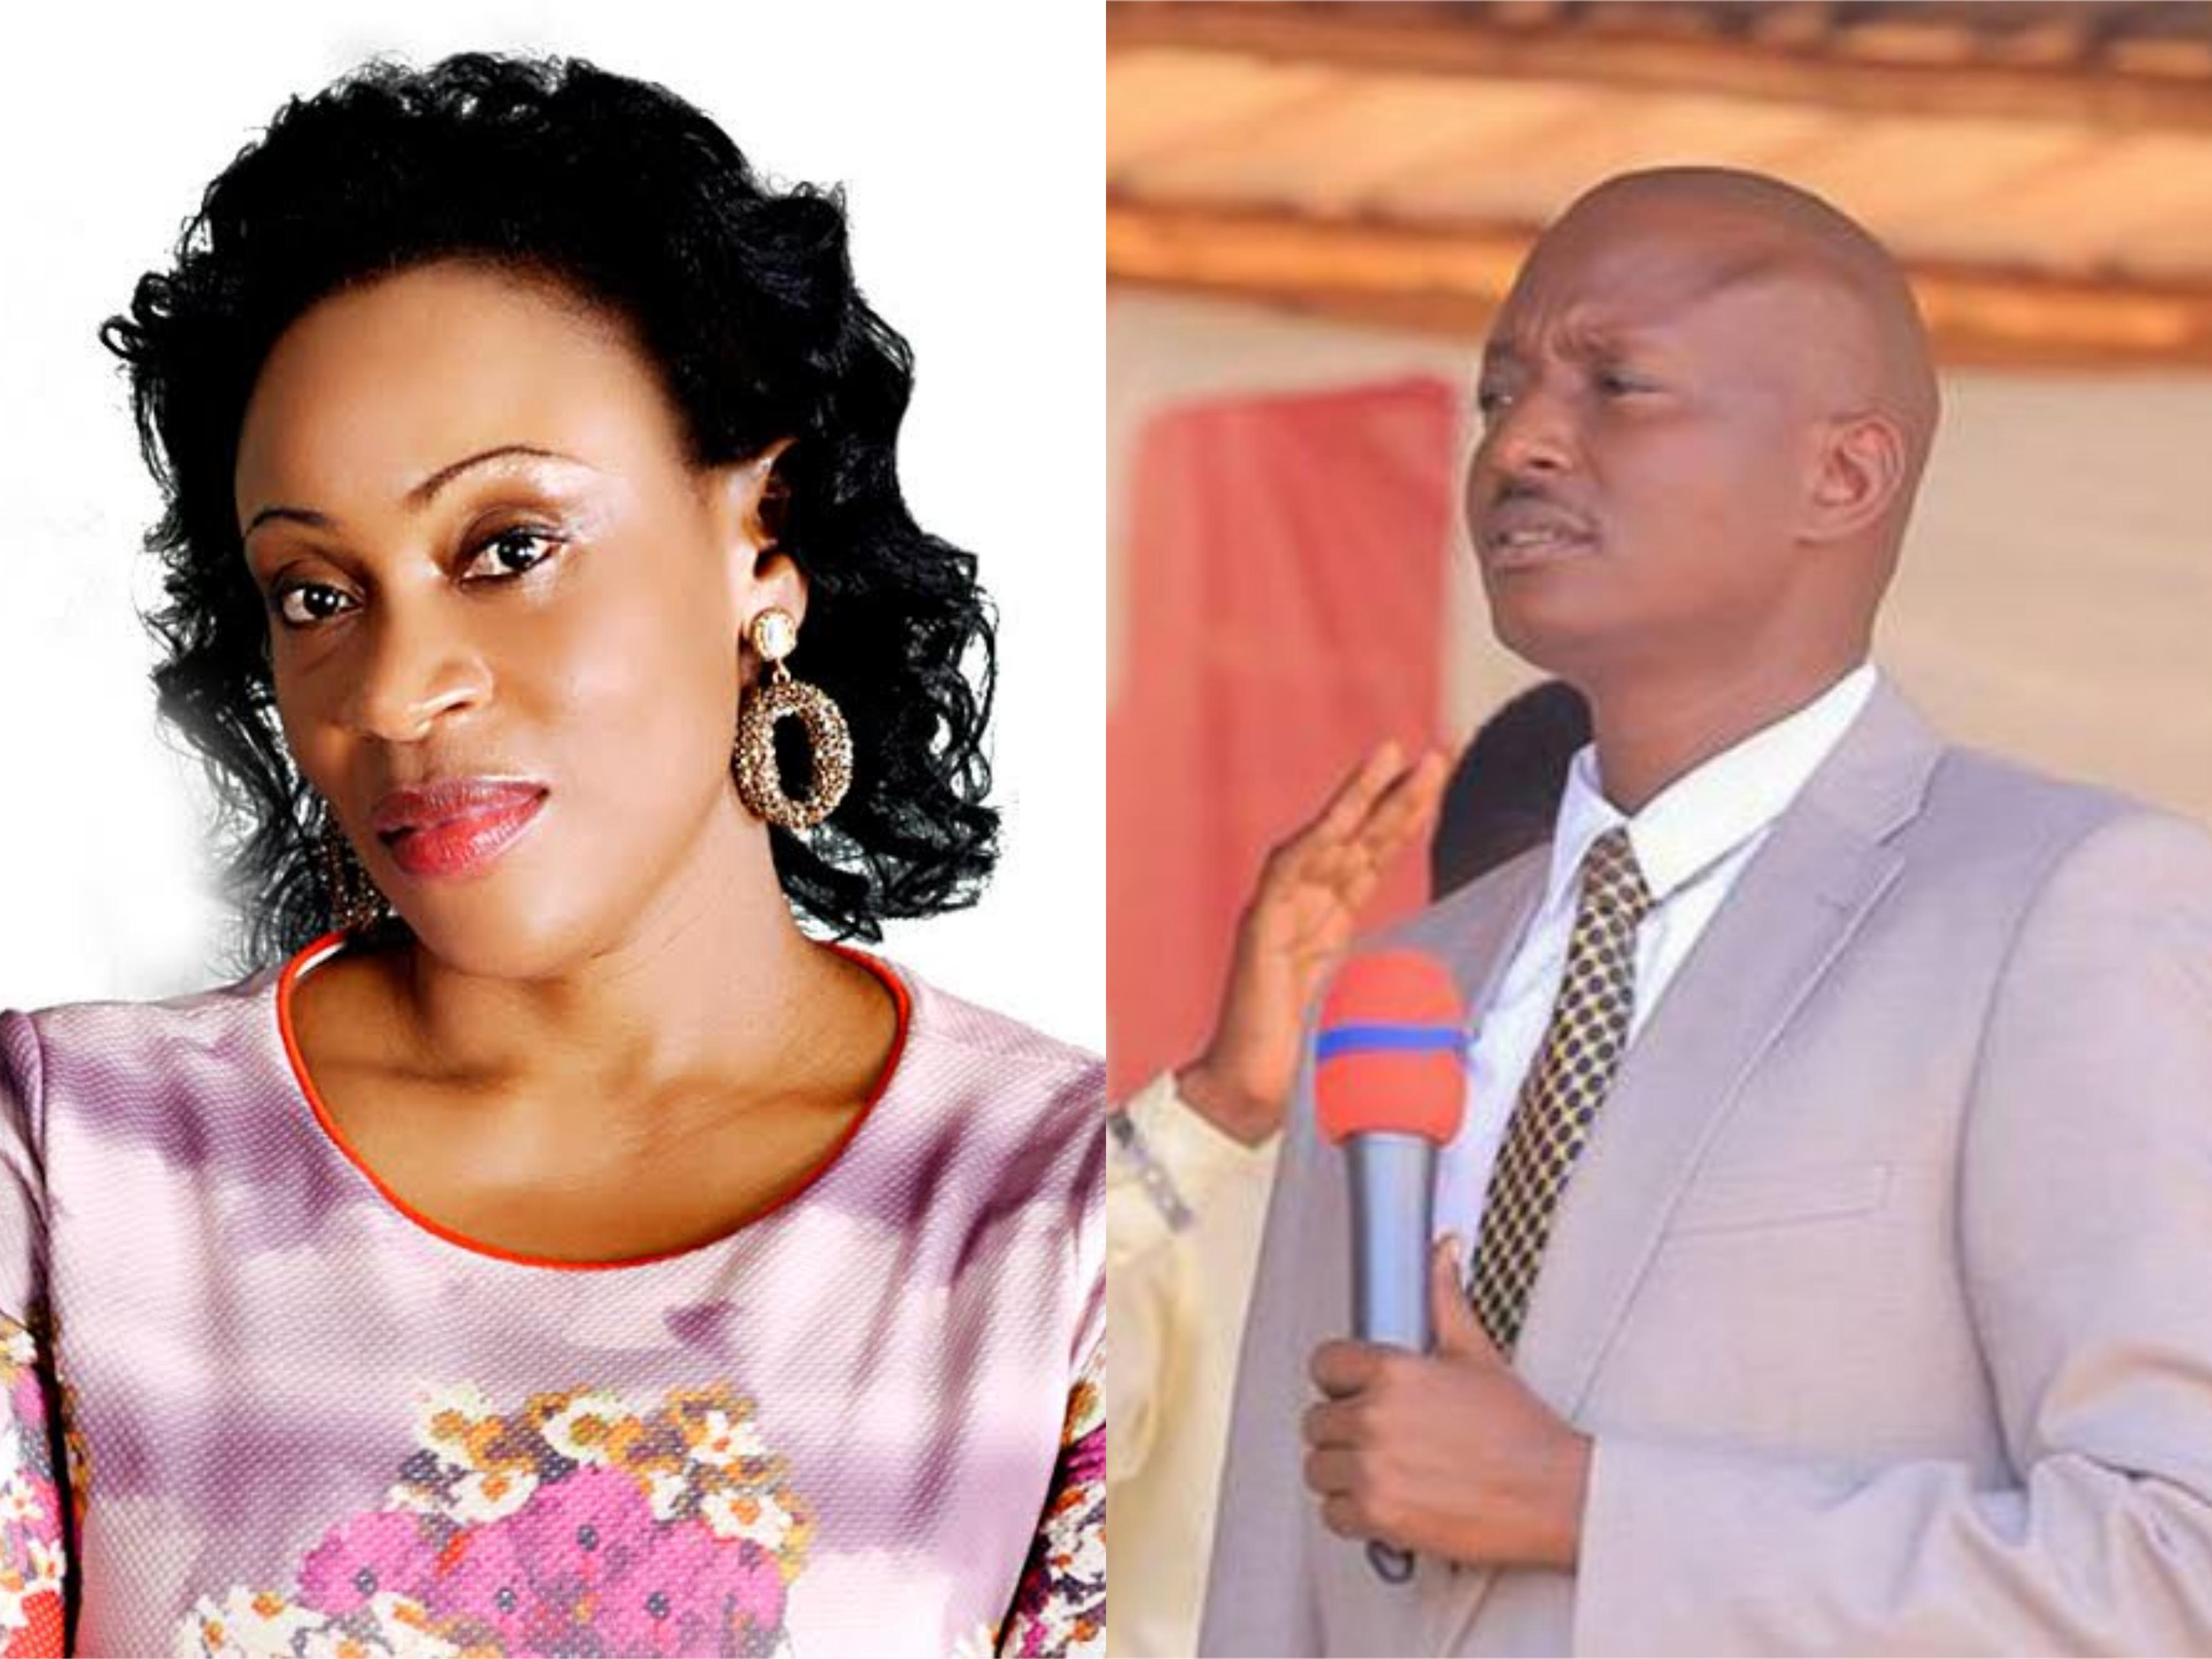 Ms. Jessica Kayanja and Pastor Aloysius Bugingo